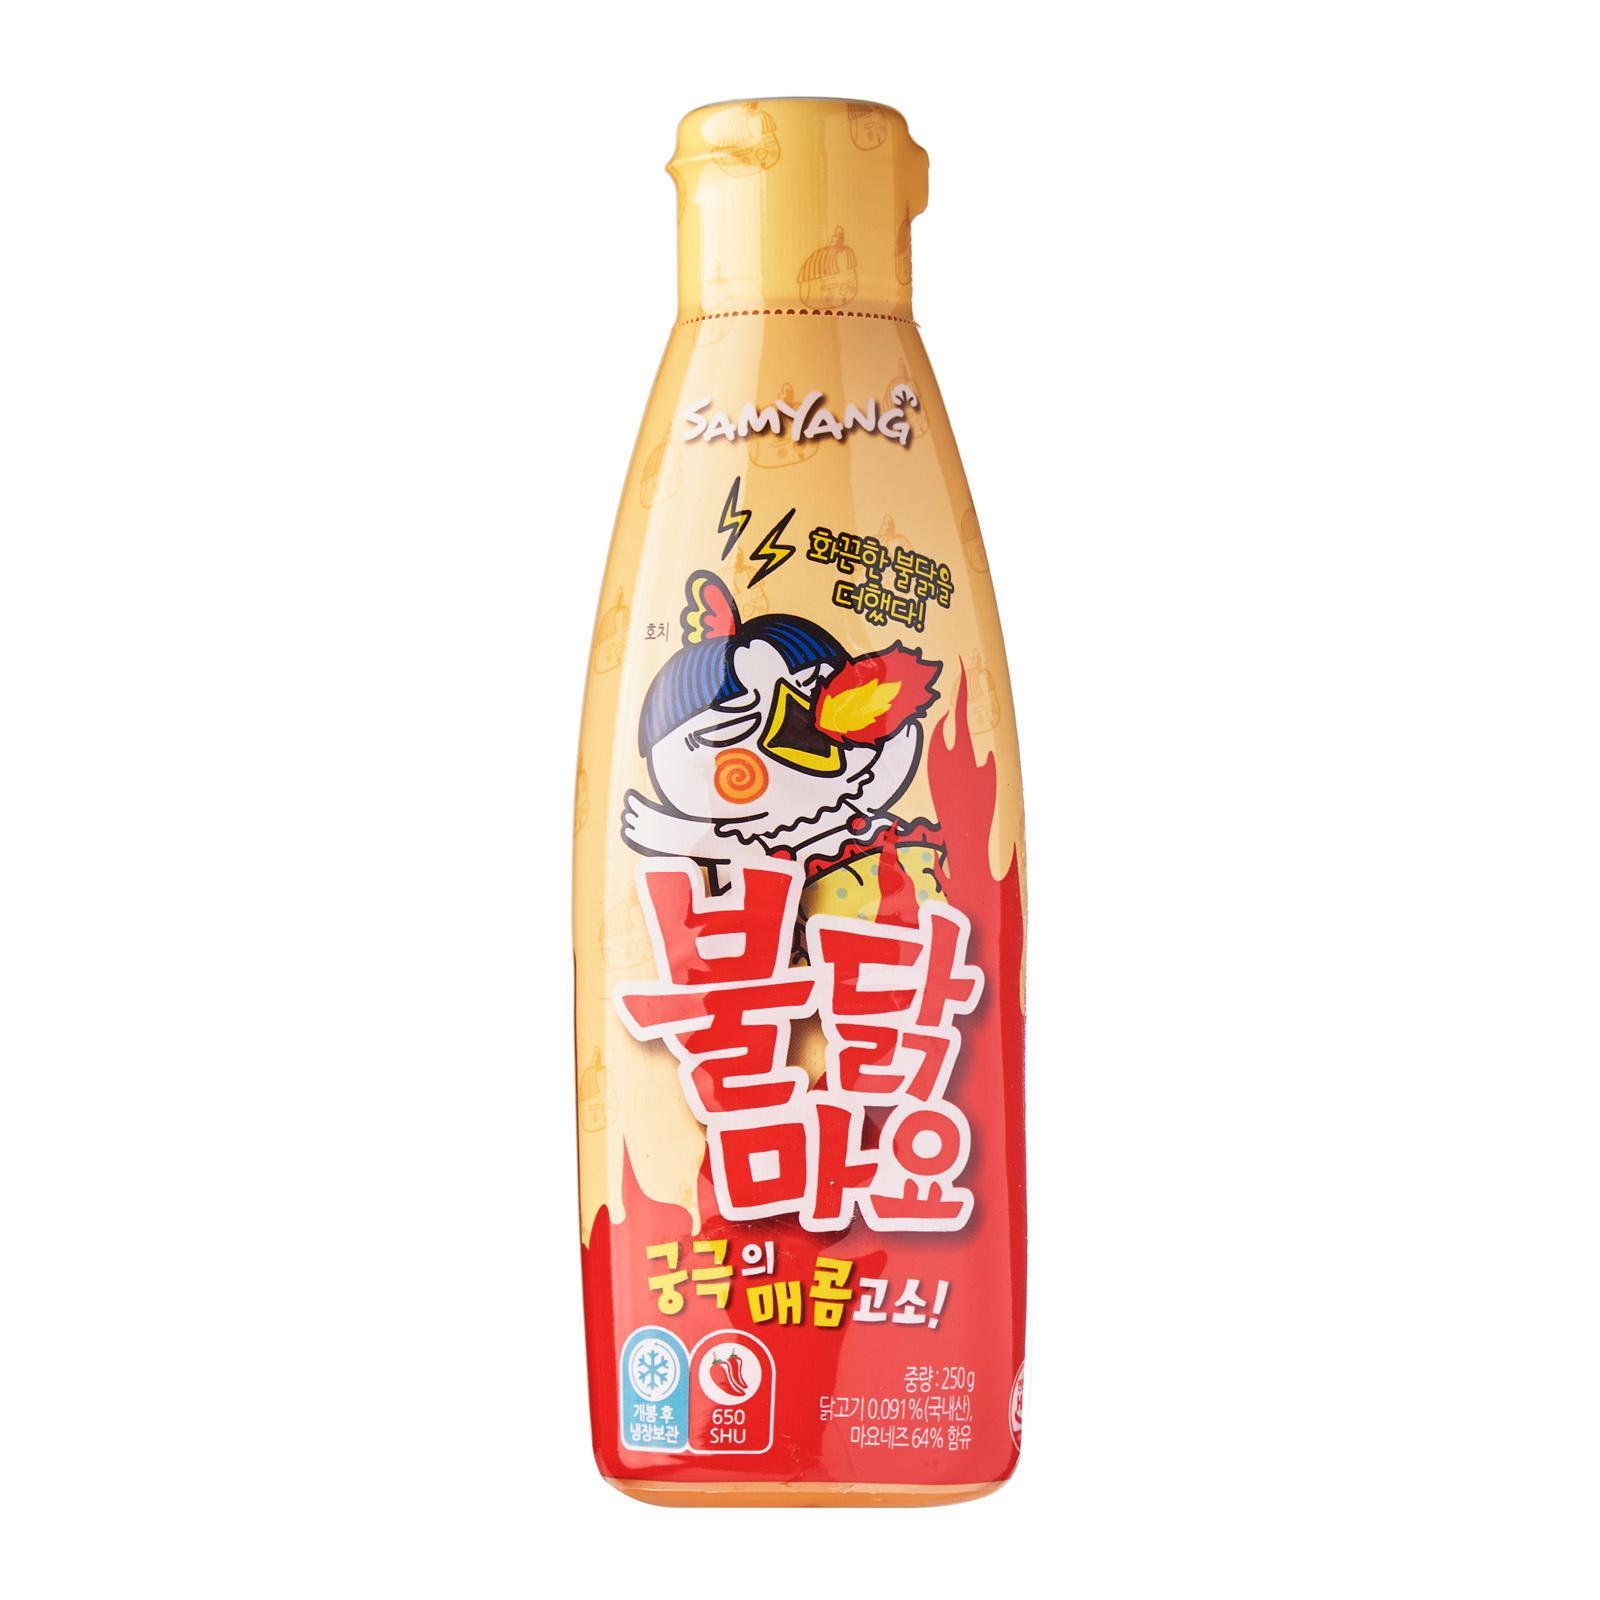 Samyang Hot Spicy Chicken Mayo Sauce 200g